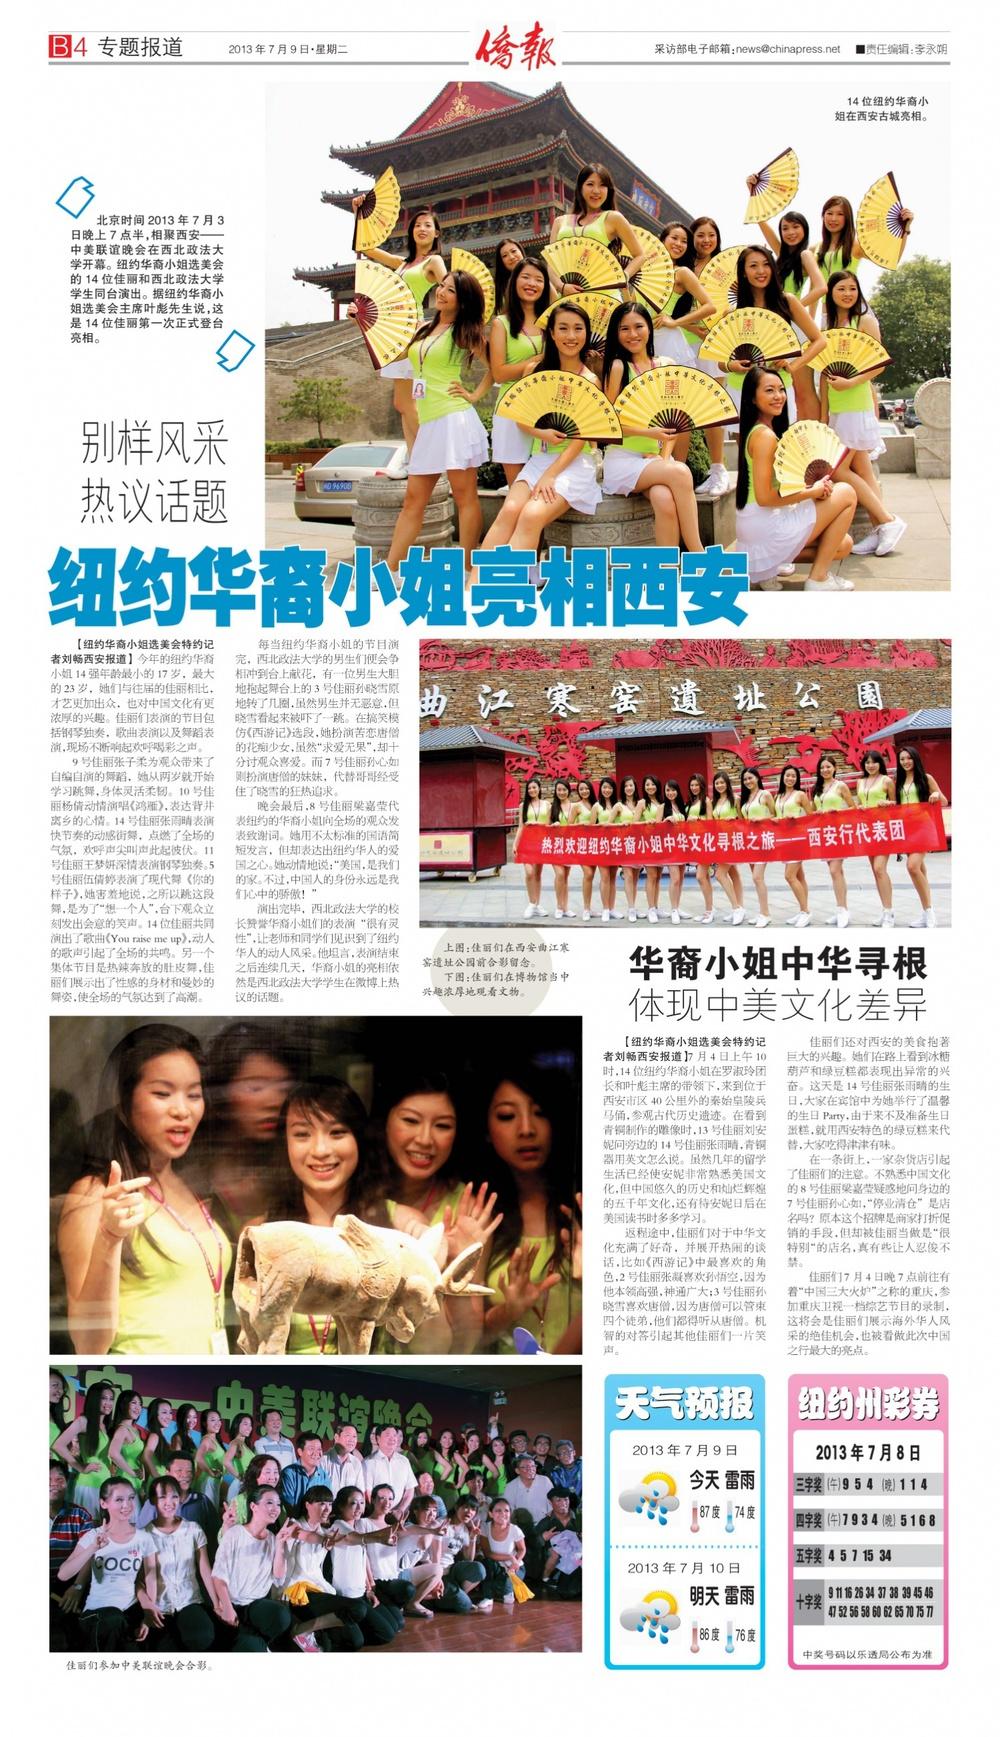 MNYCBP_2130_ChinaTip_001_Xian.jpg